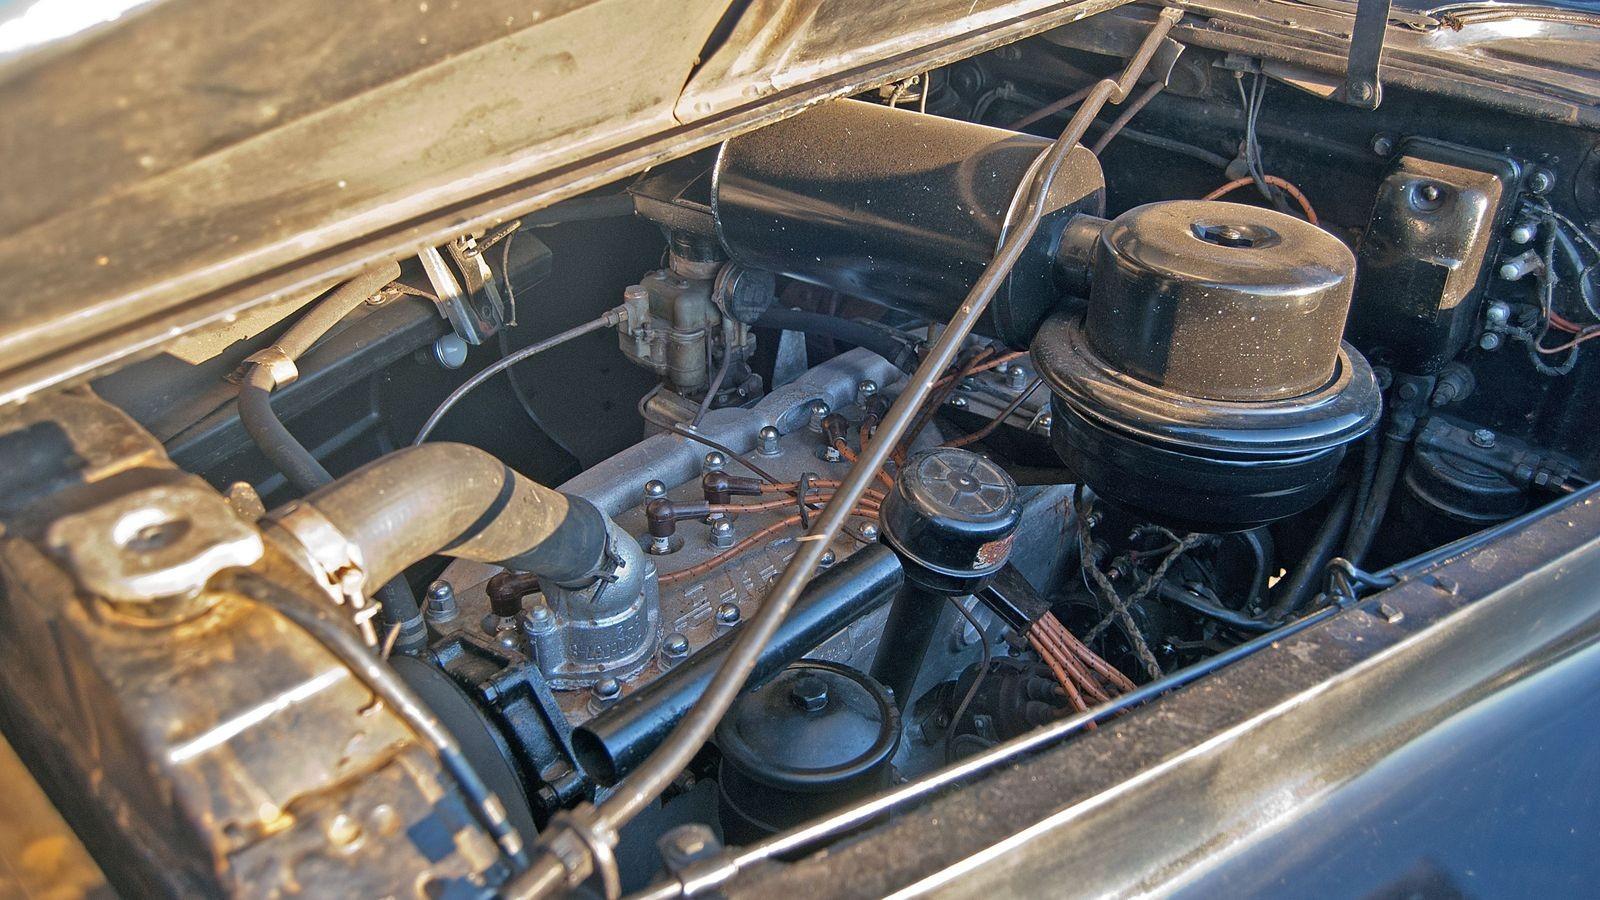 Паккард по-советски: тест-драйв ЗИС-110Б, на котором (возможно) возили Фиделя Кастро